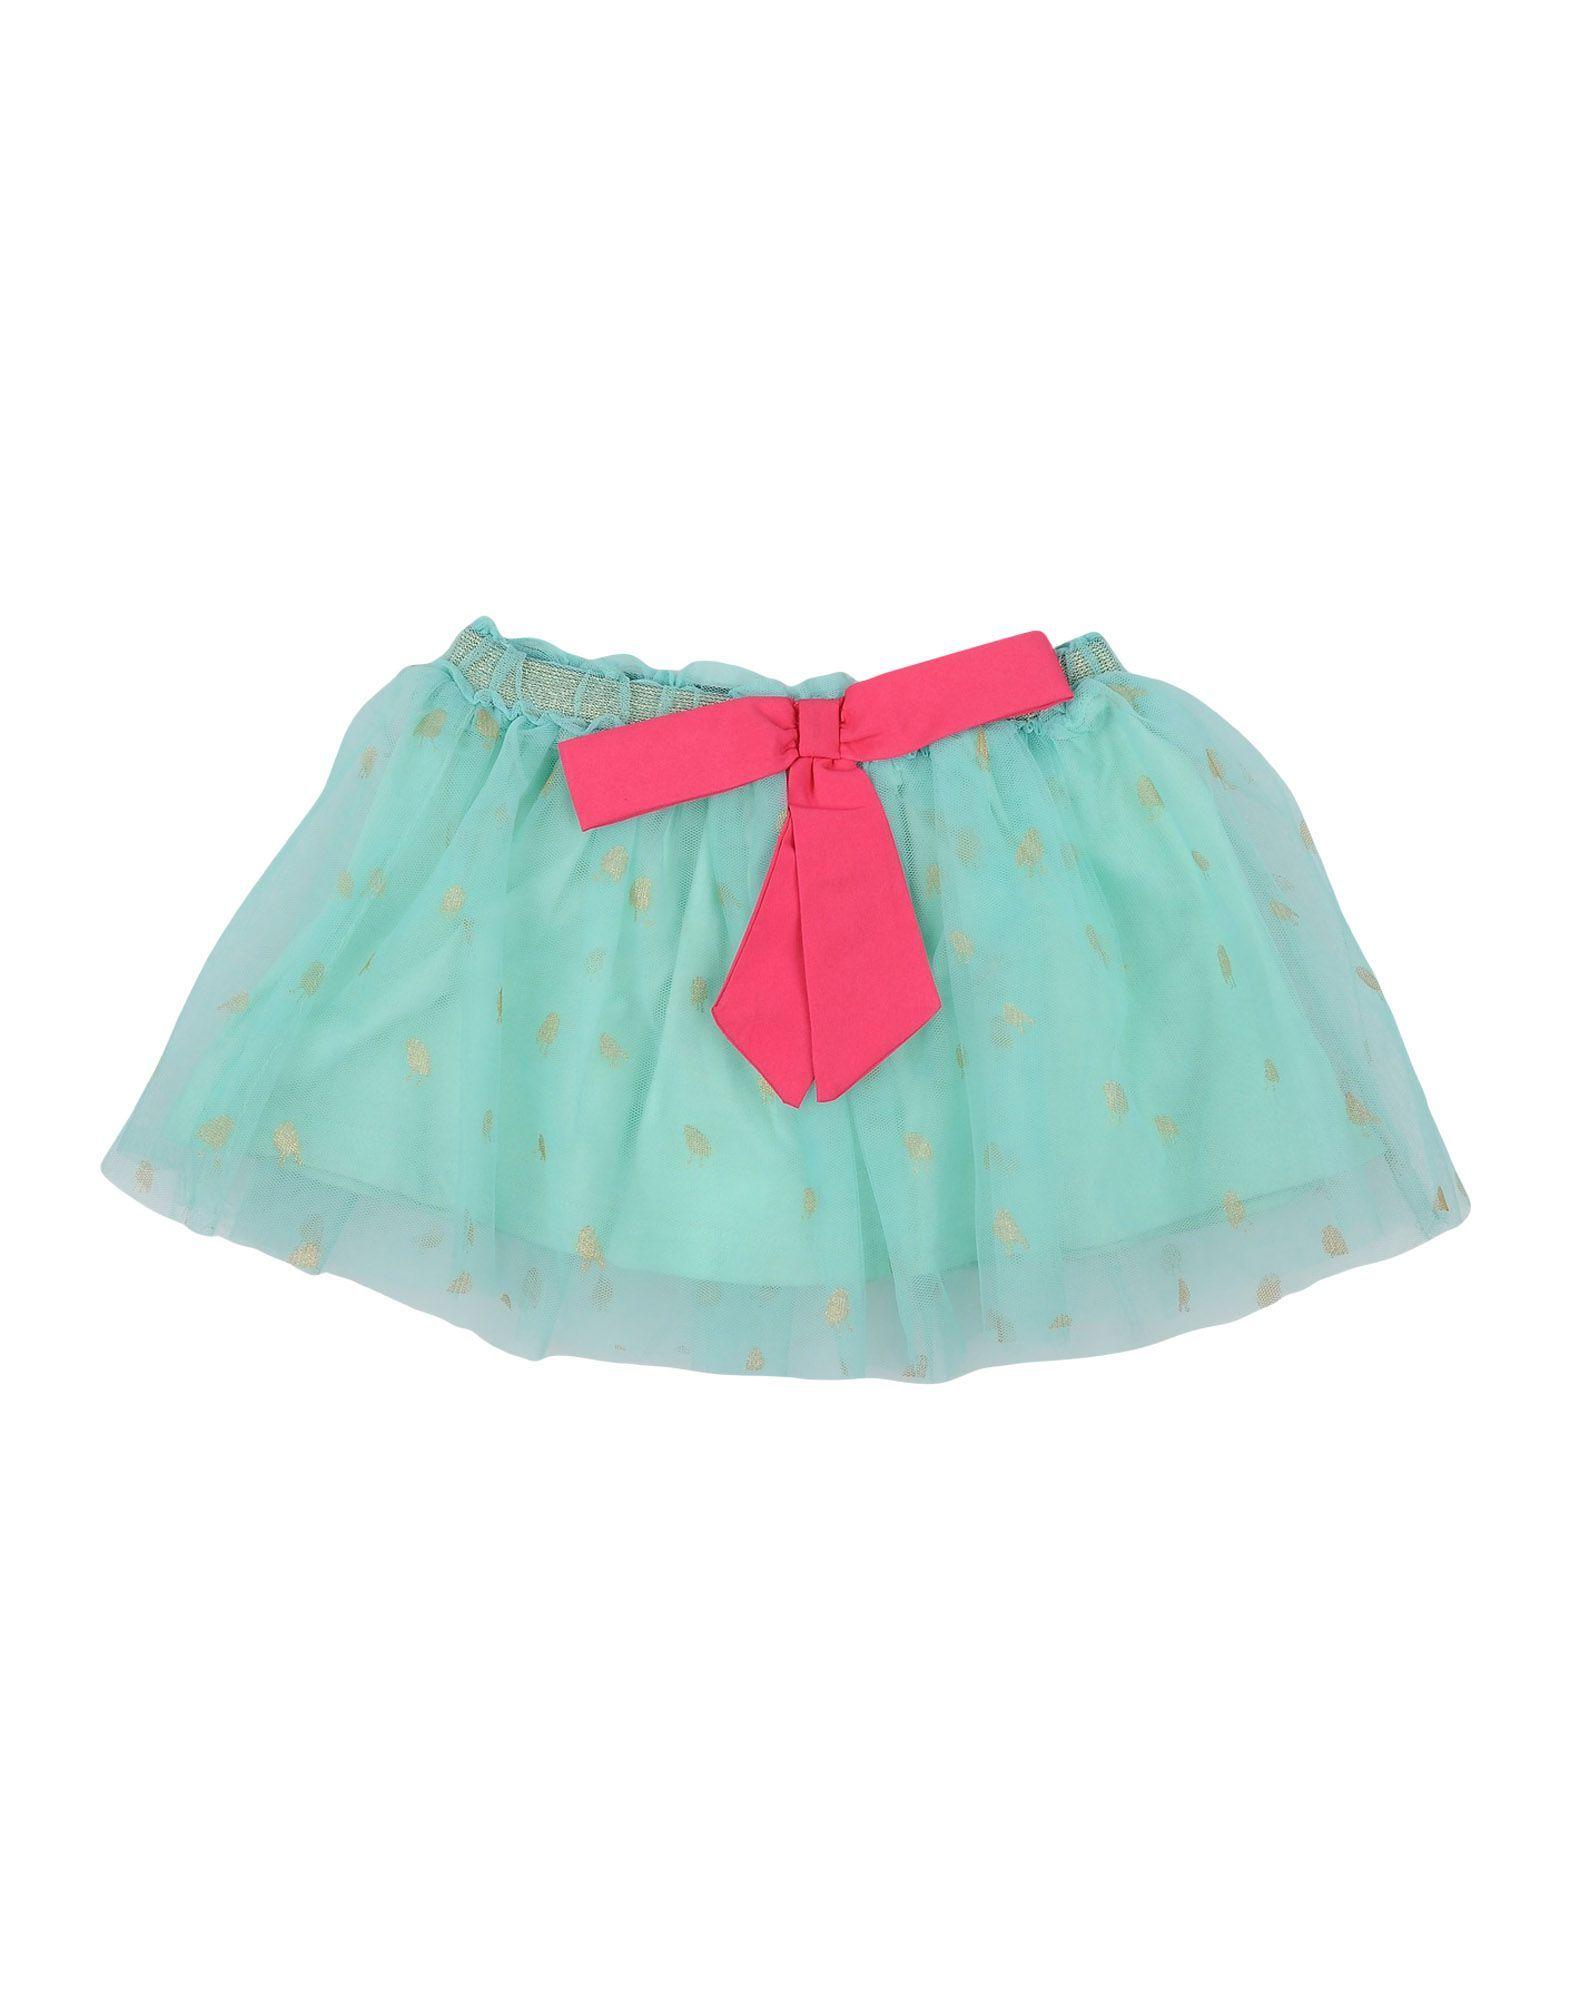 Beetlejuice Green Girls' Nylon Skirt